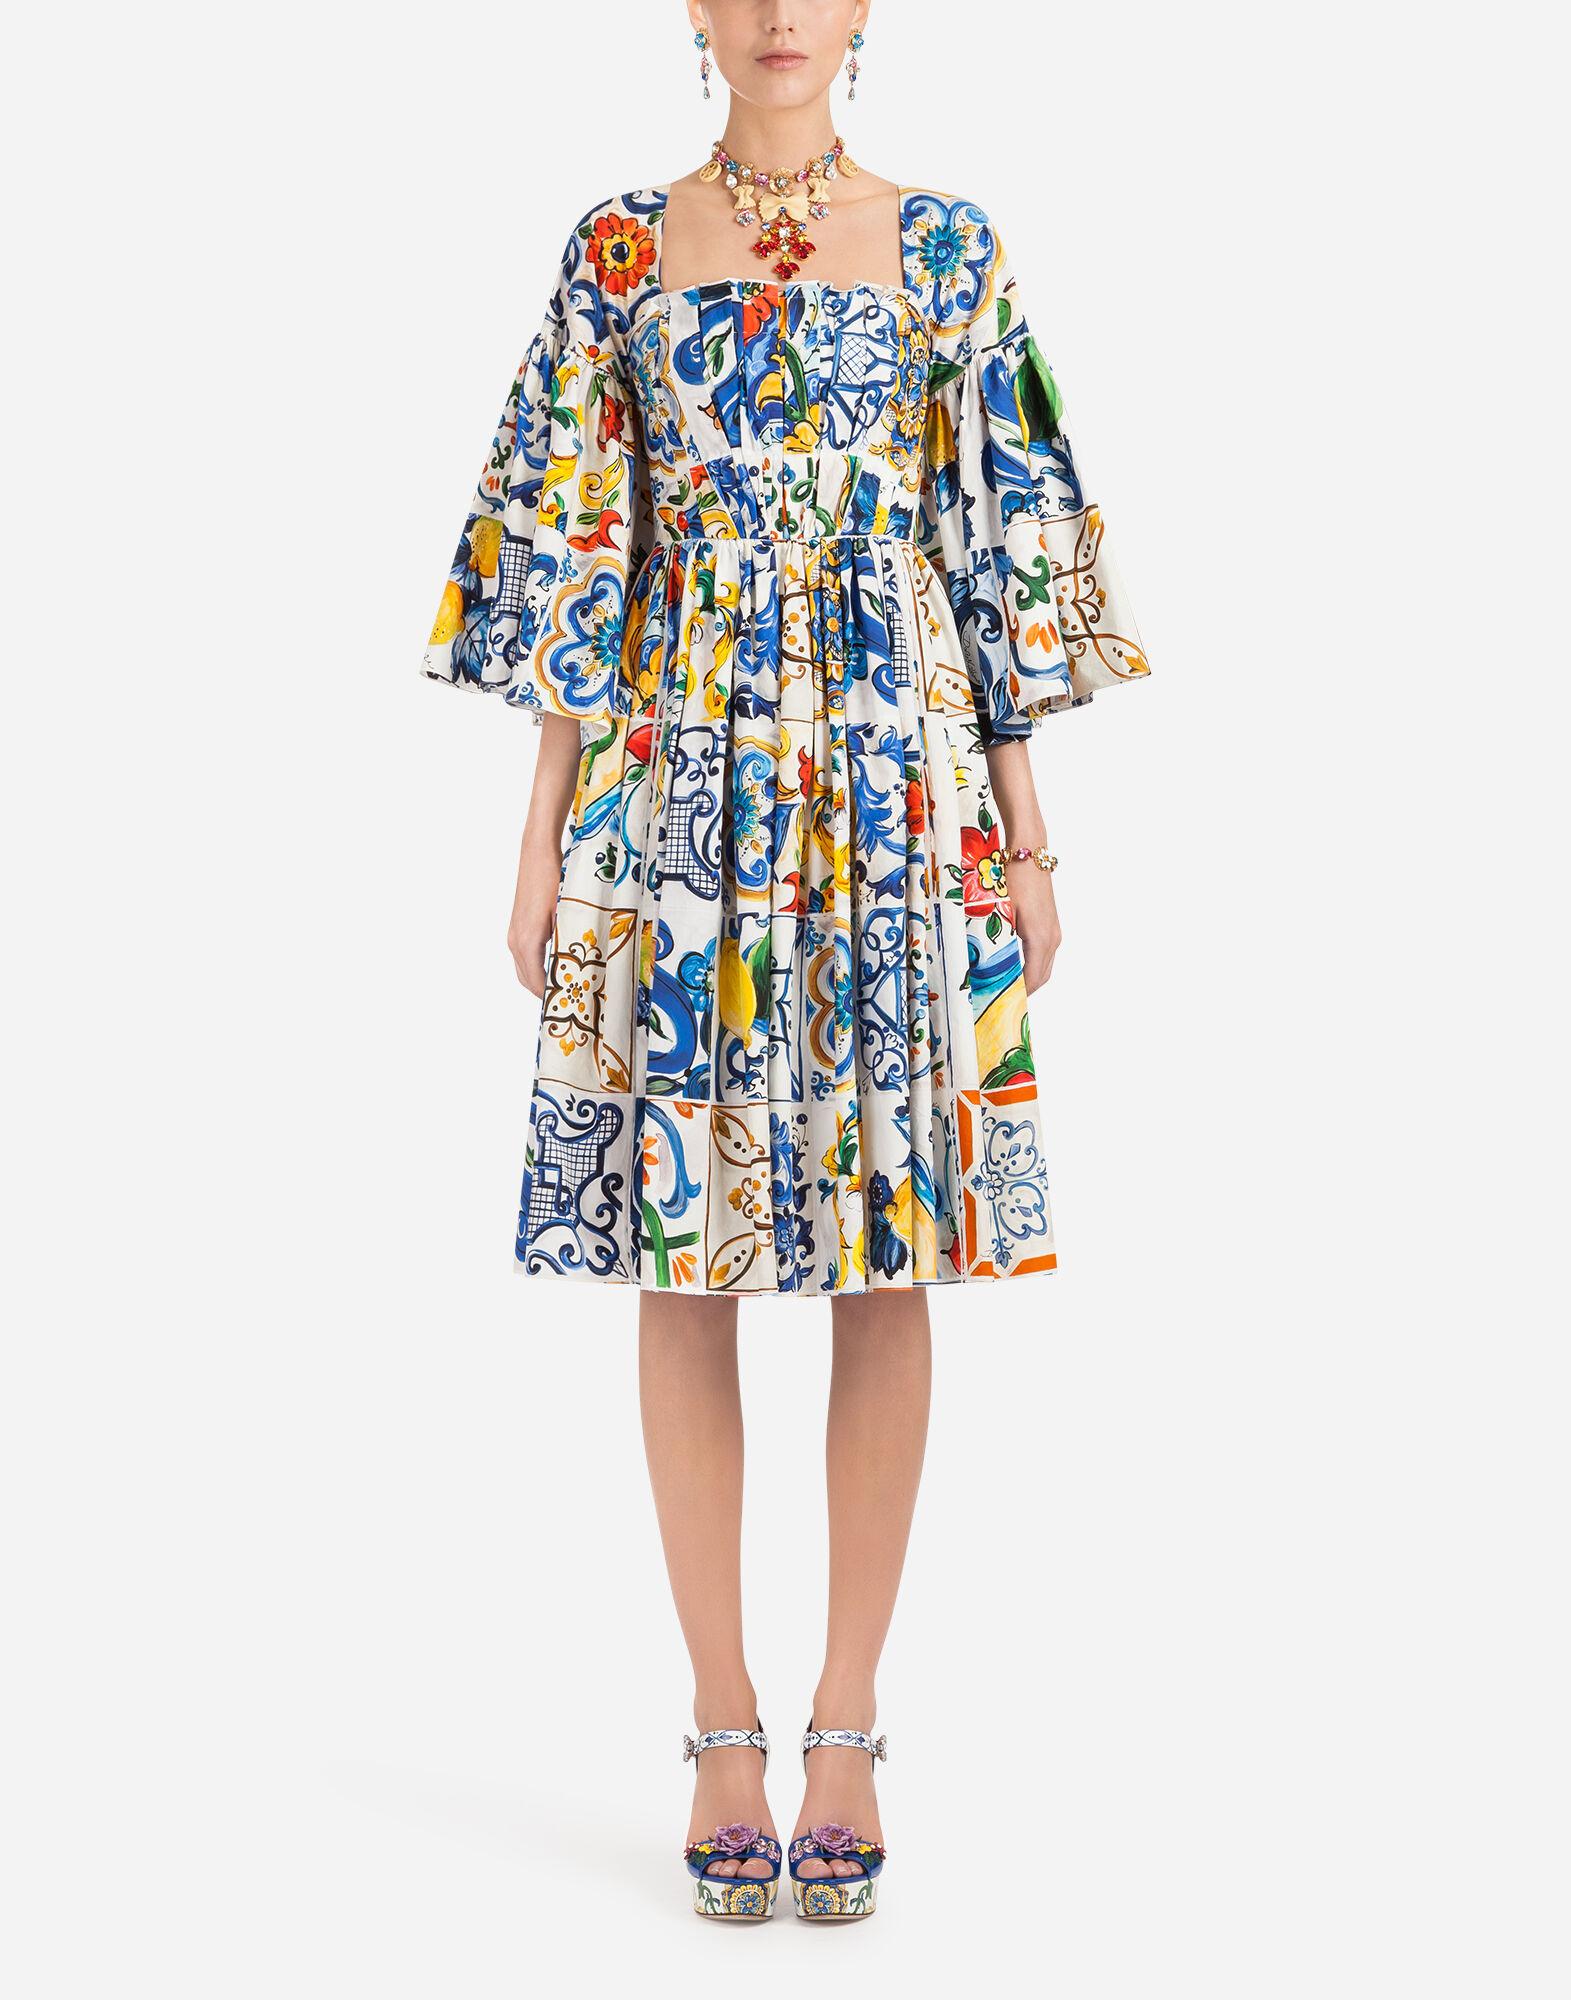 MAJOLICA-PRINT COTTON DRESS